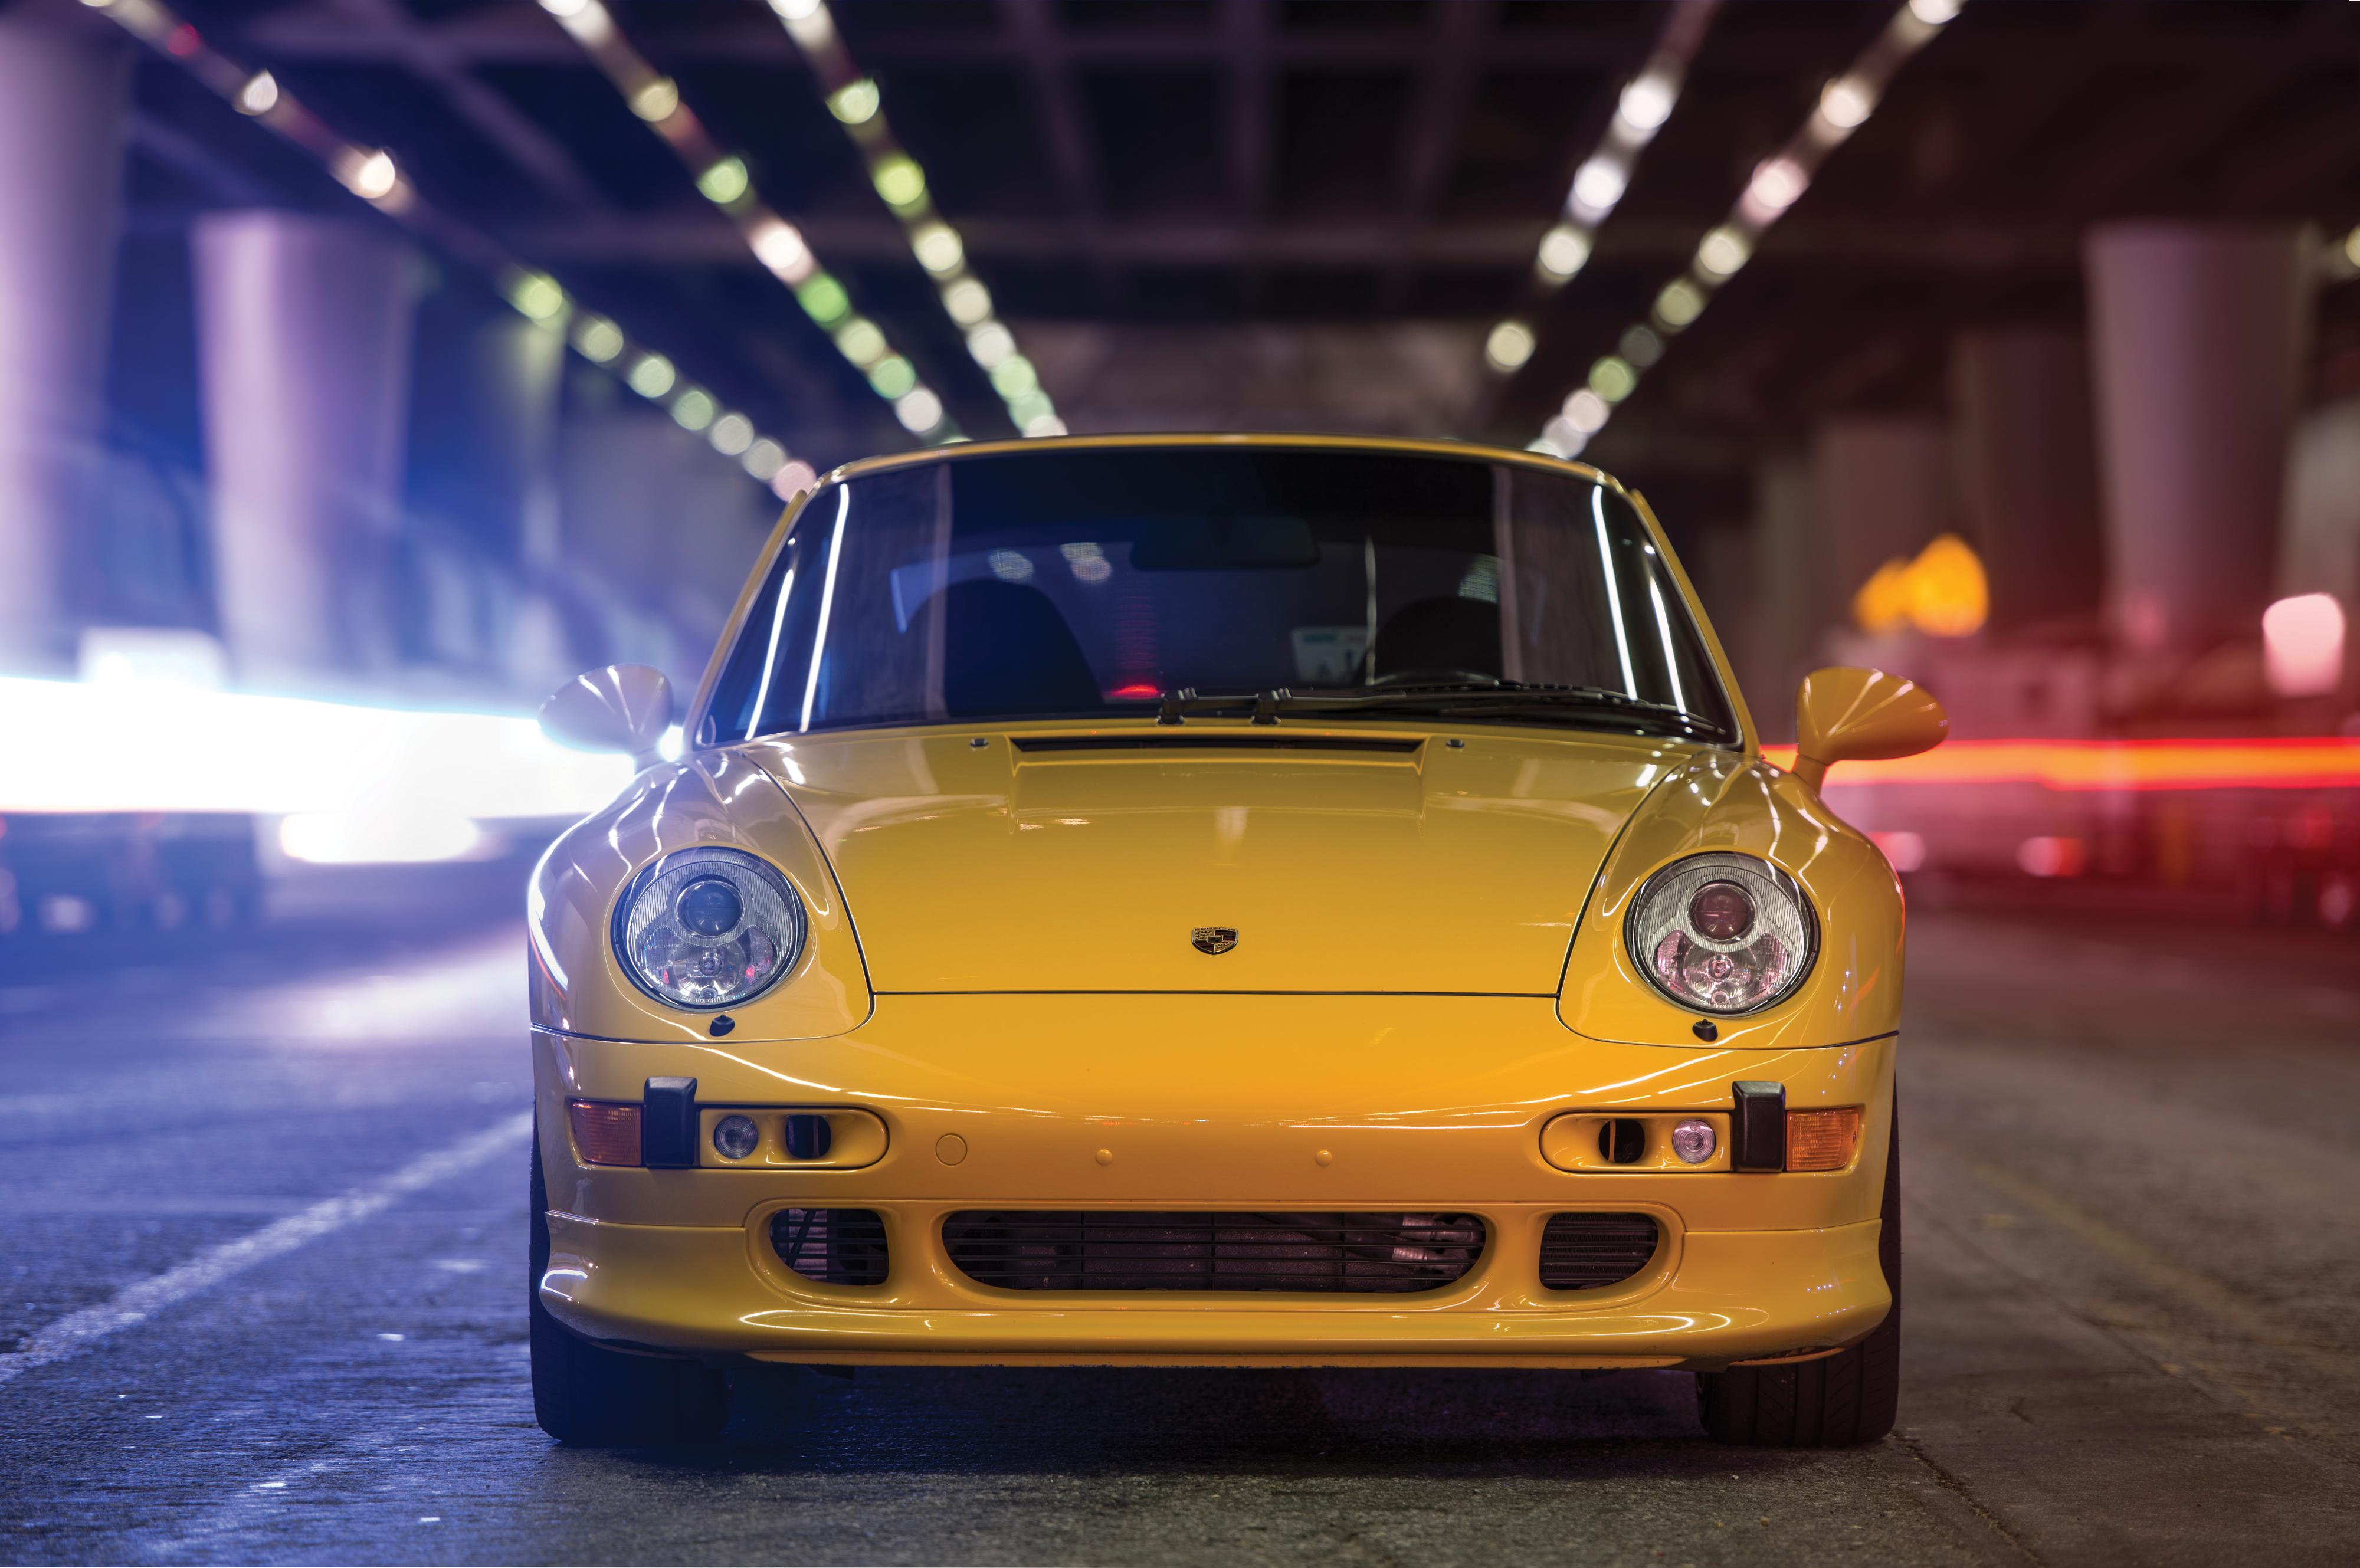 1997 porsche 911 turbo s coupe 4k 1618920194 - 1997 Porsche 911 Turbo S Coupe 4k - 1997 Porsche 911 Turbo S Coupe 4k wallpapers